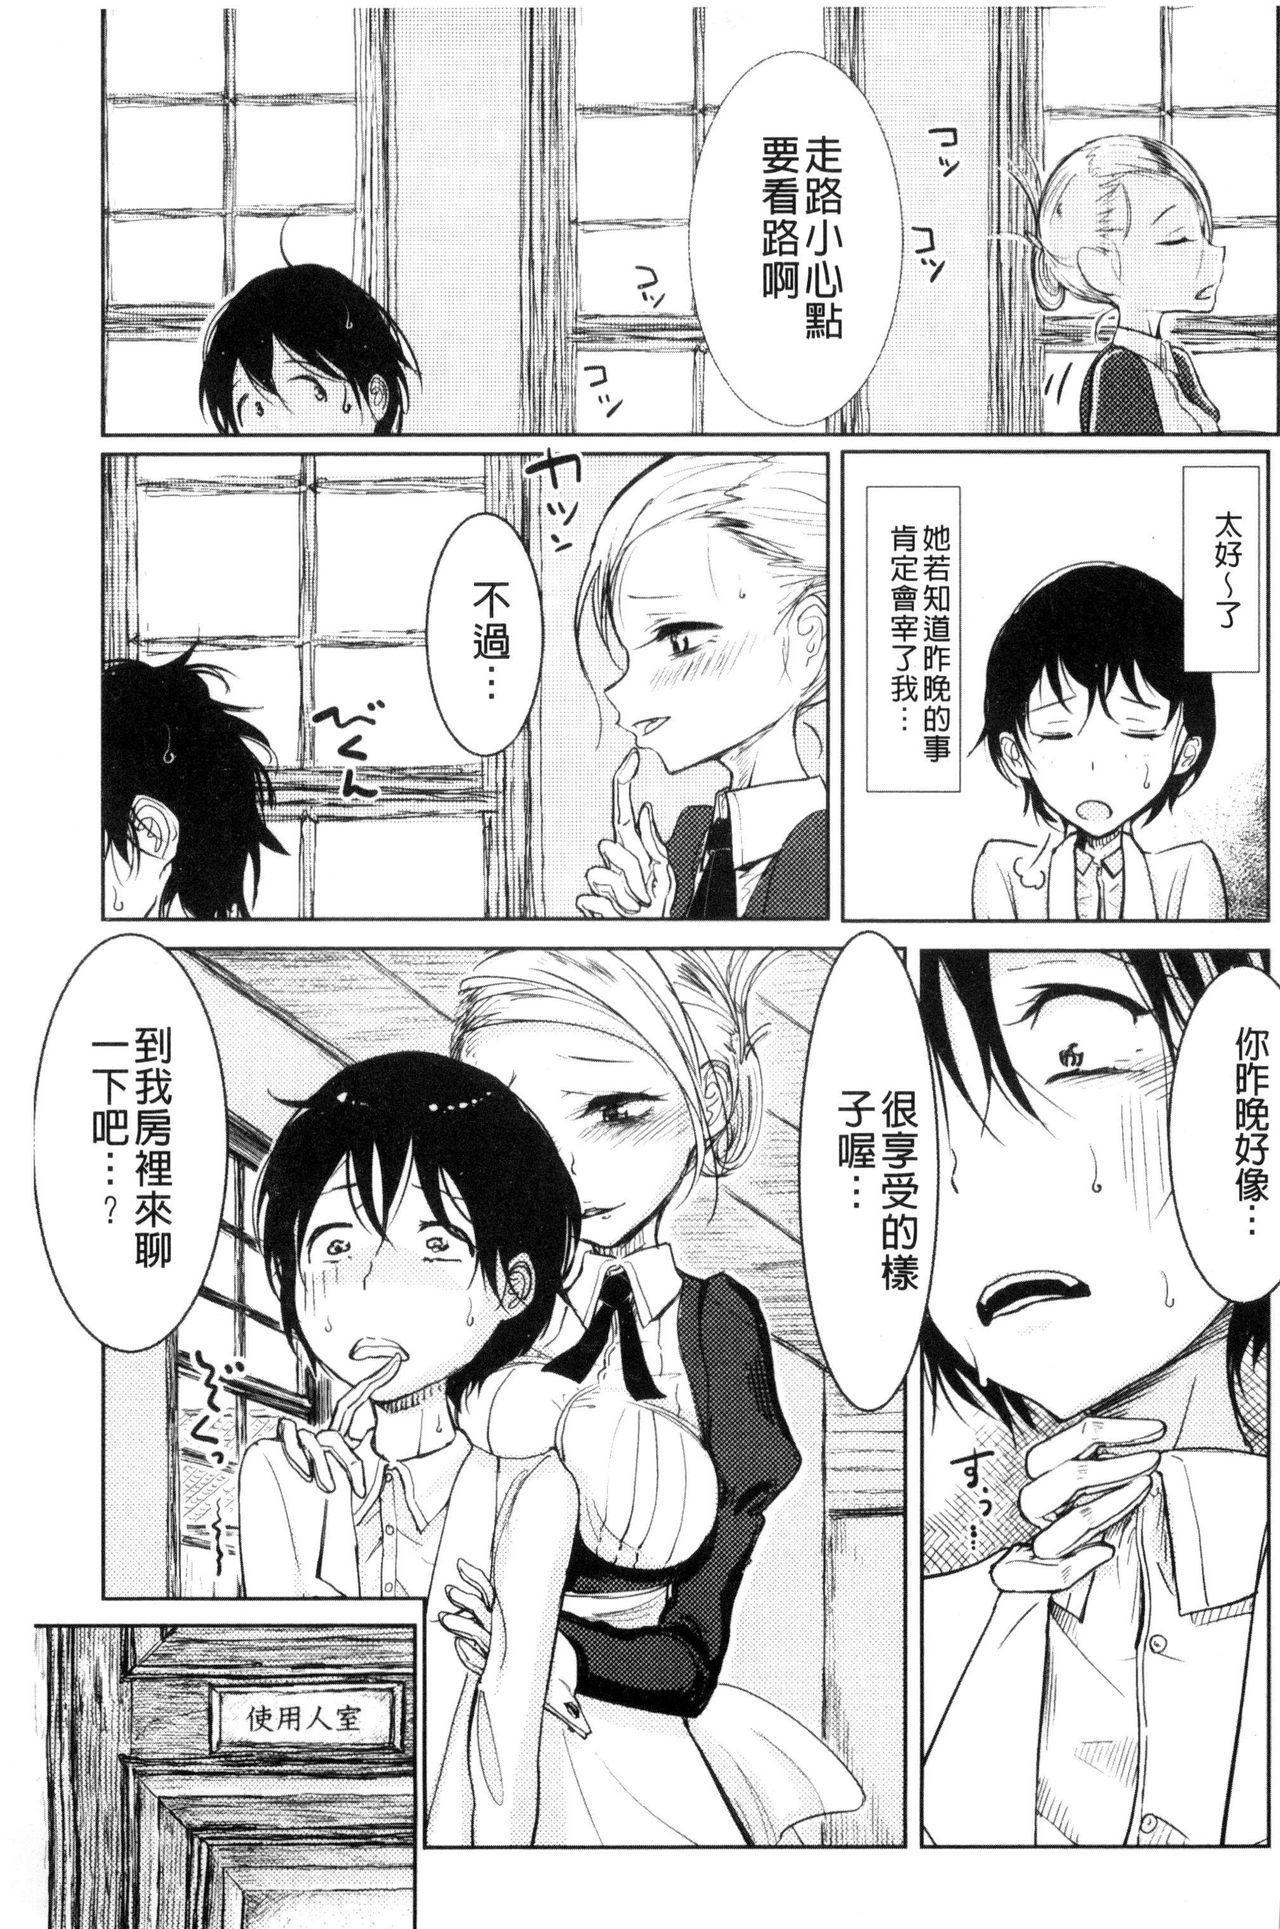 [Dhibi] Sono Yubisaki de Korogashite - Please Caress it at the Finger-tip. [Chinese] 22